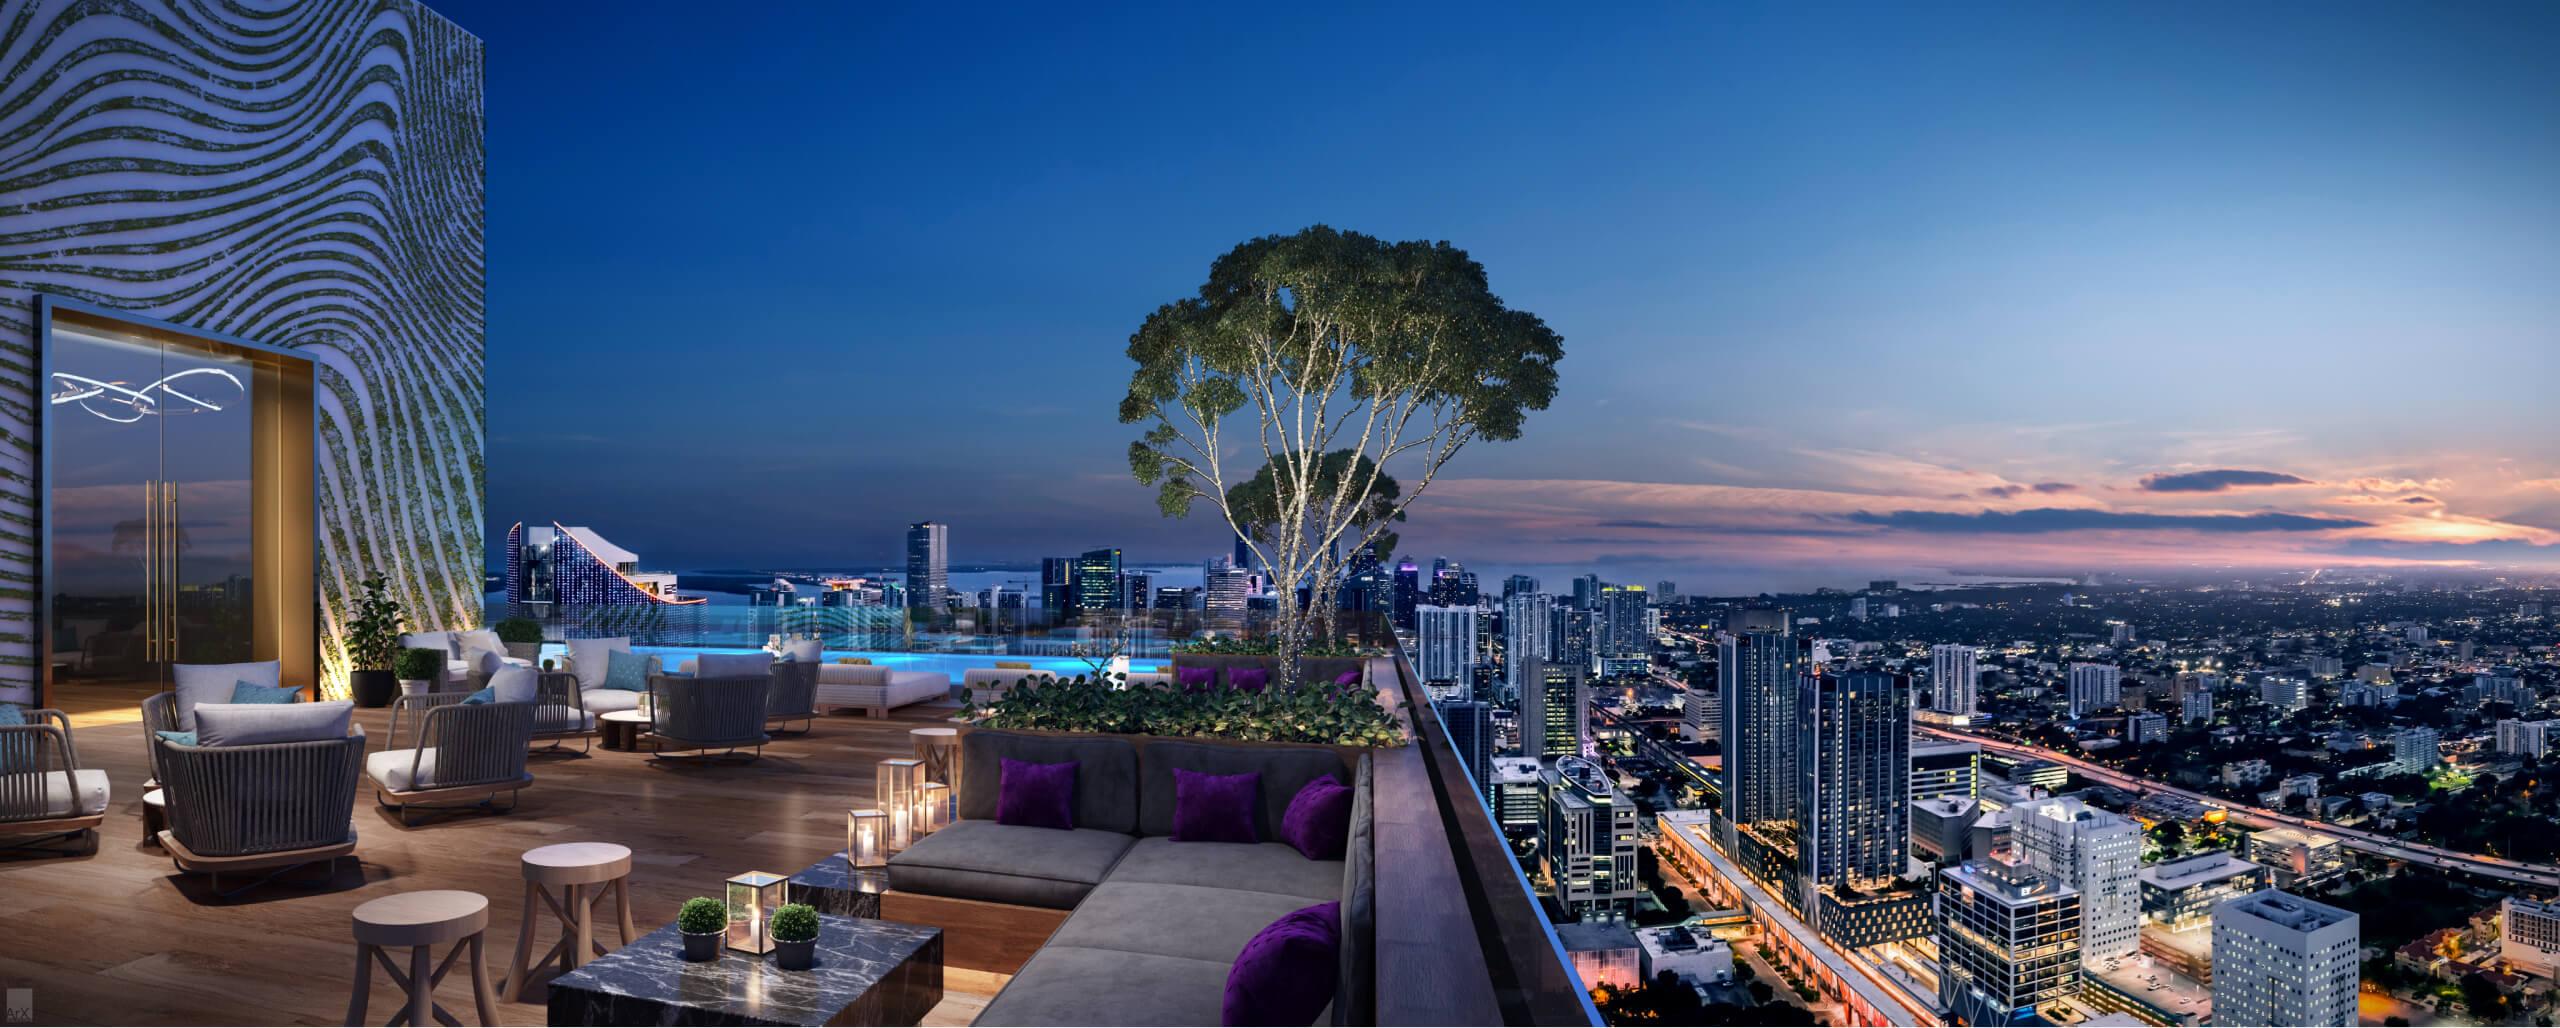 Rooftop Deck. Designed by AvroKO Hospitality Group & Studio Ramirez.